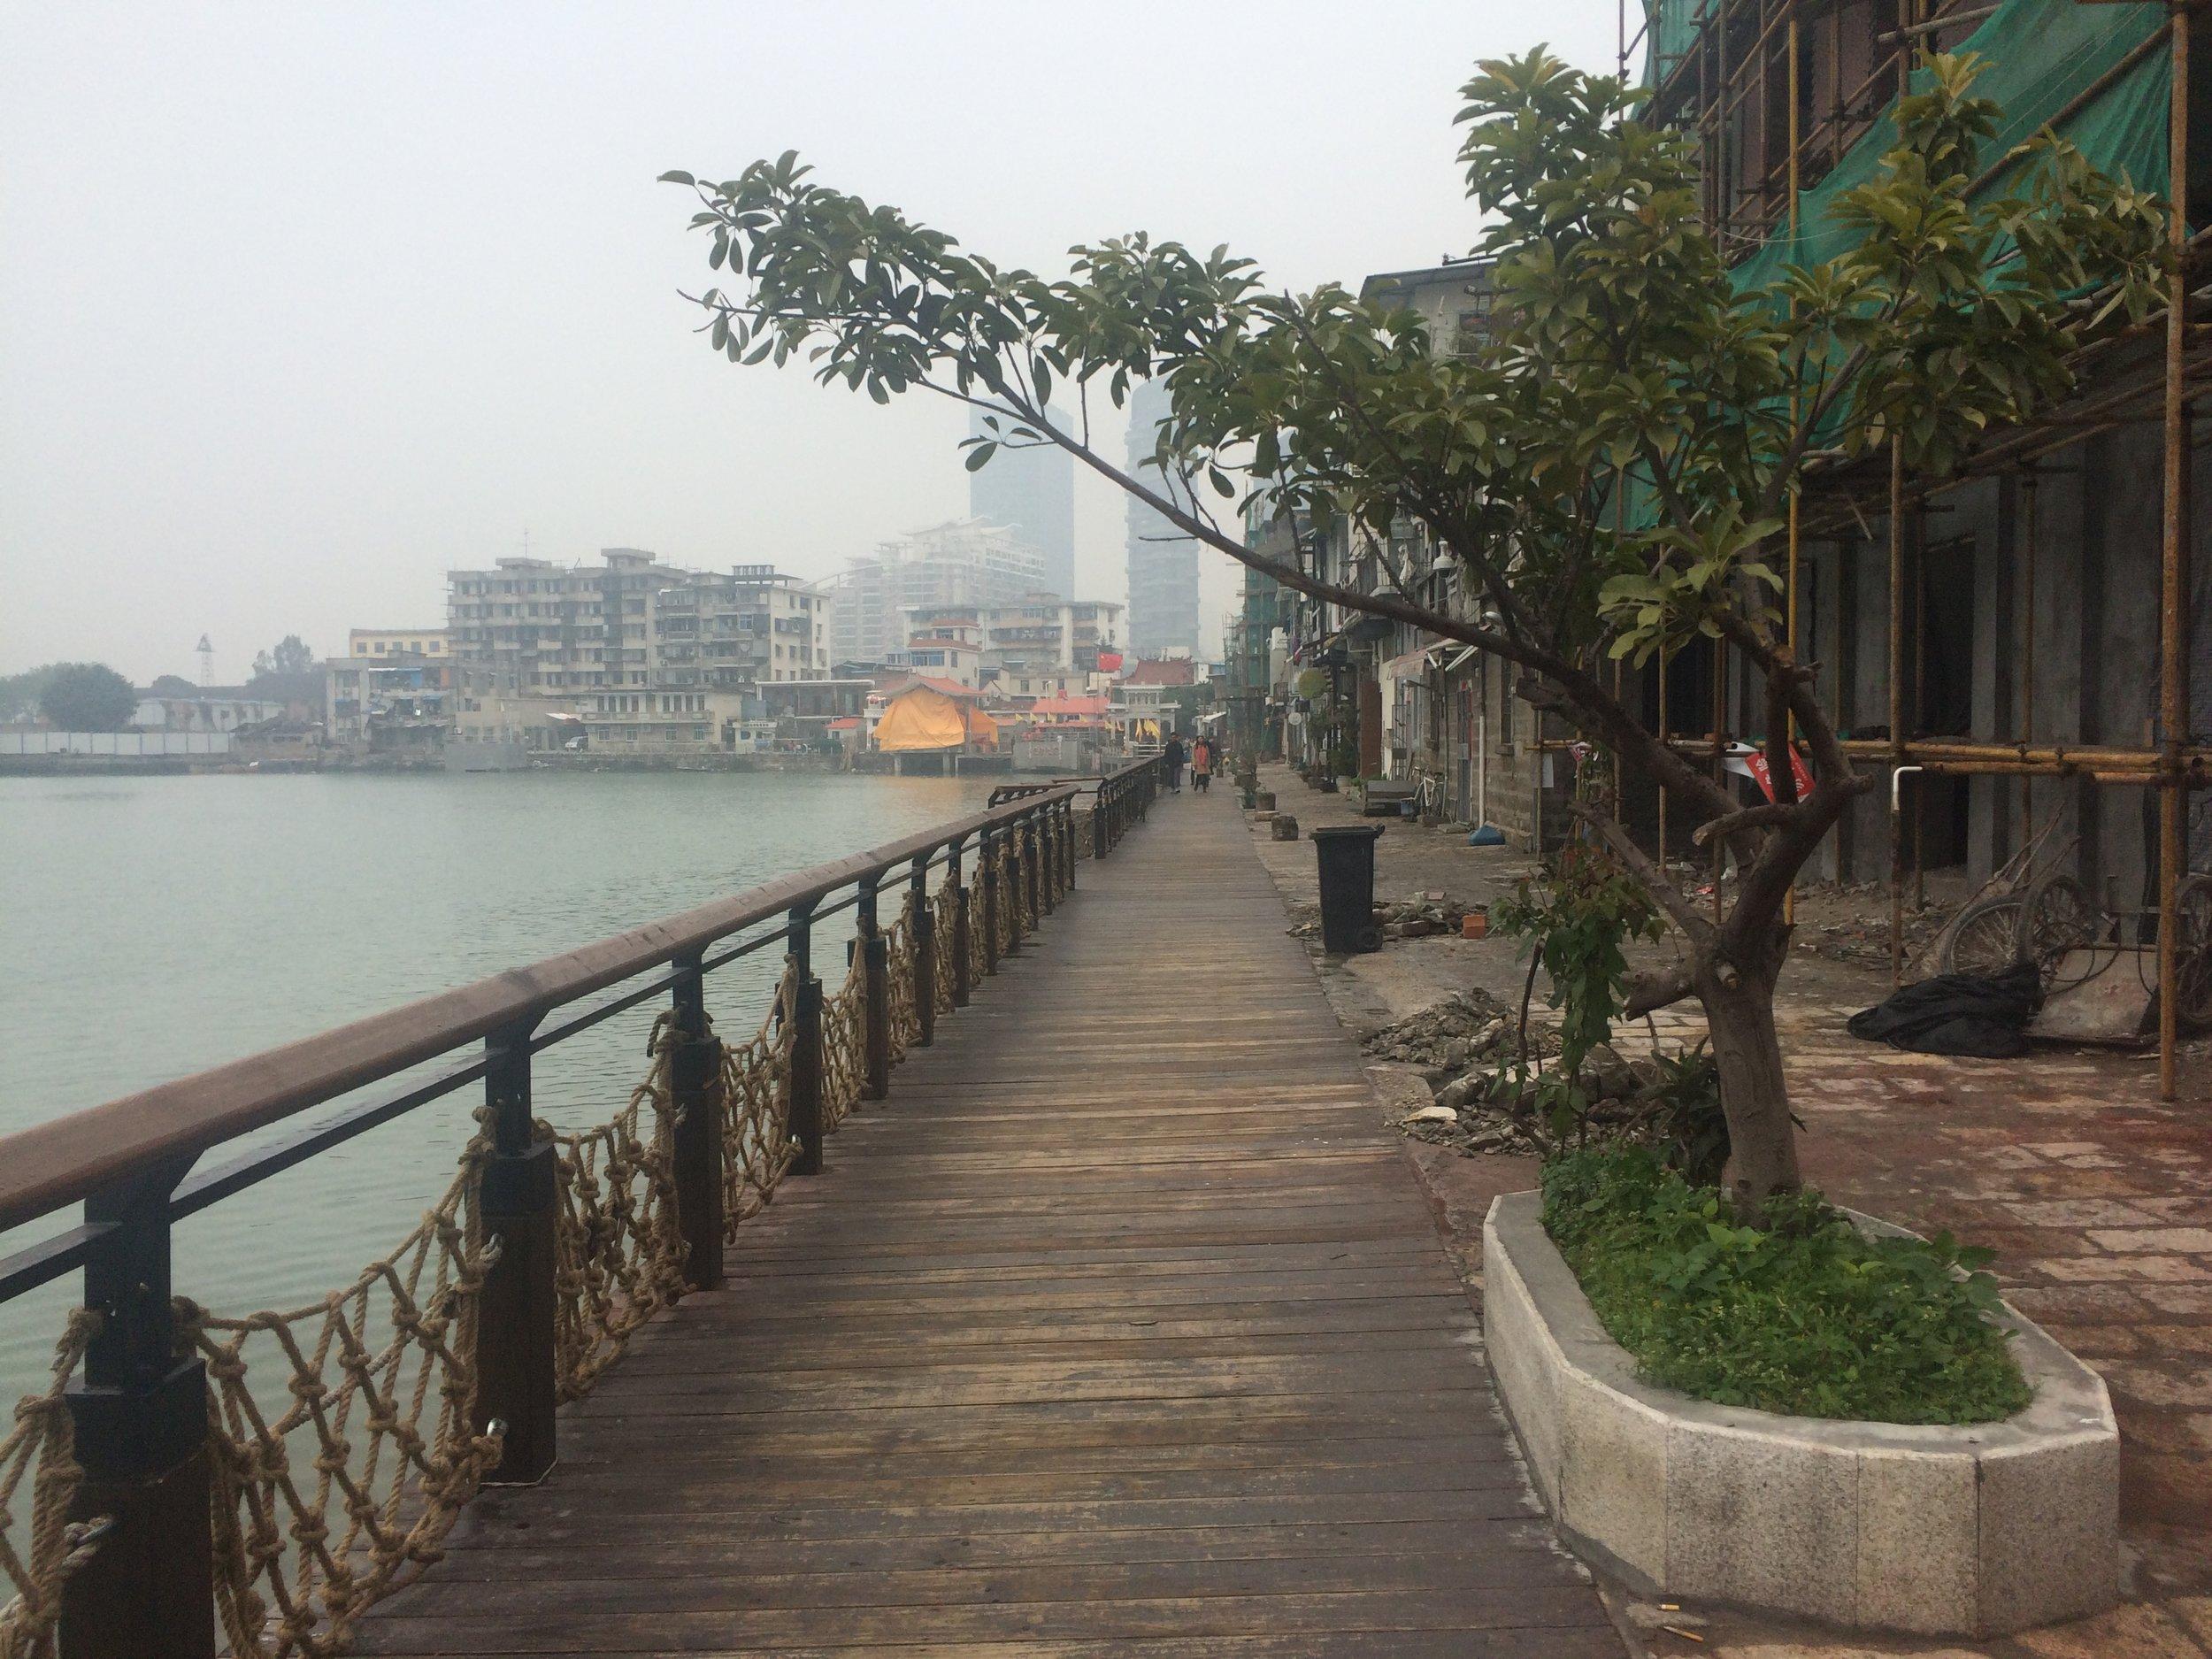 Walking the streets of Xiamen on a misty morning